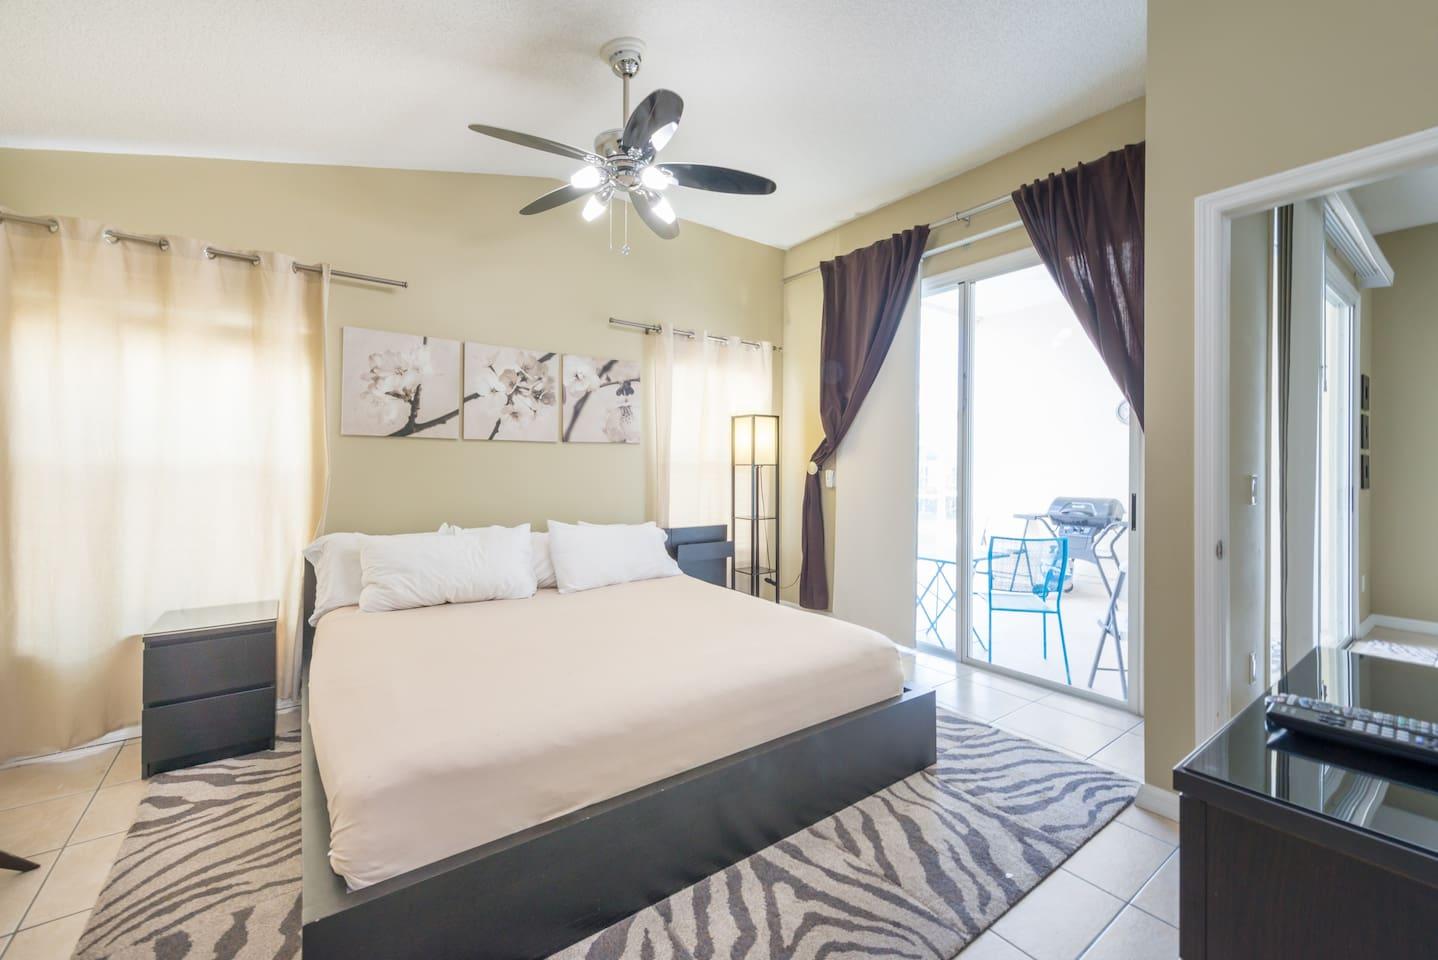 Spacious 3BR Home + King Bed: Near Disney w/ Pool! photo 17048486